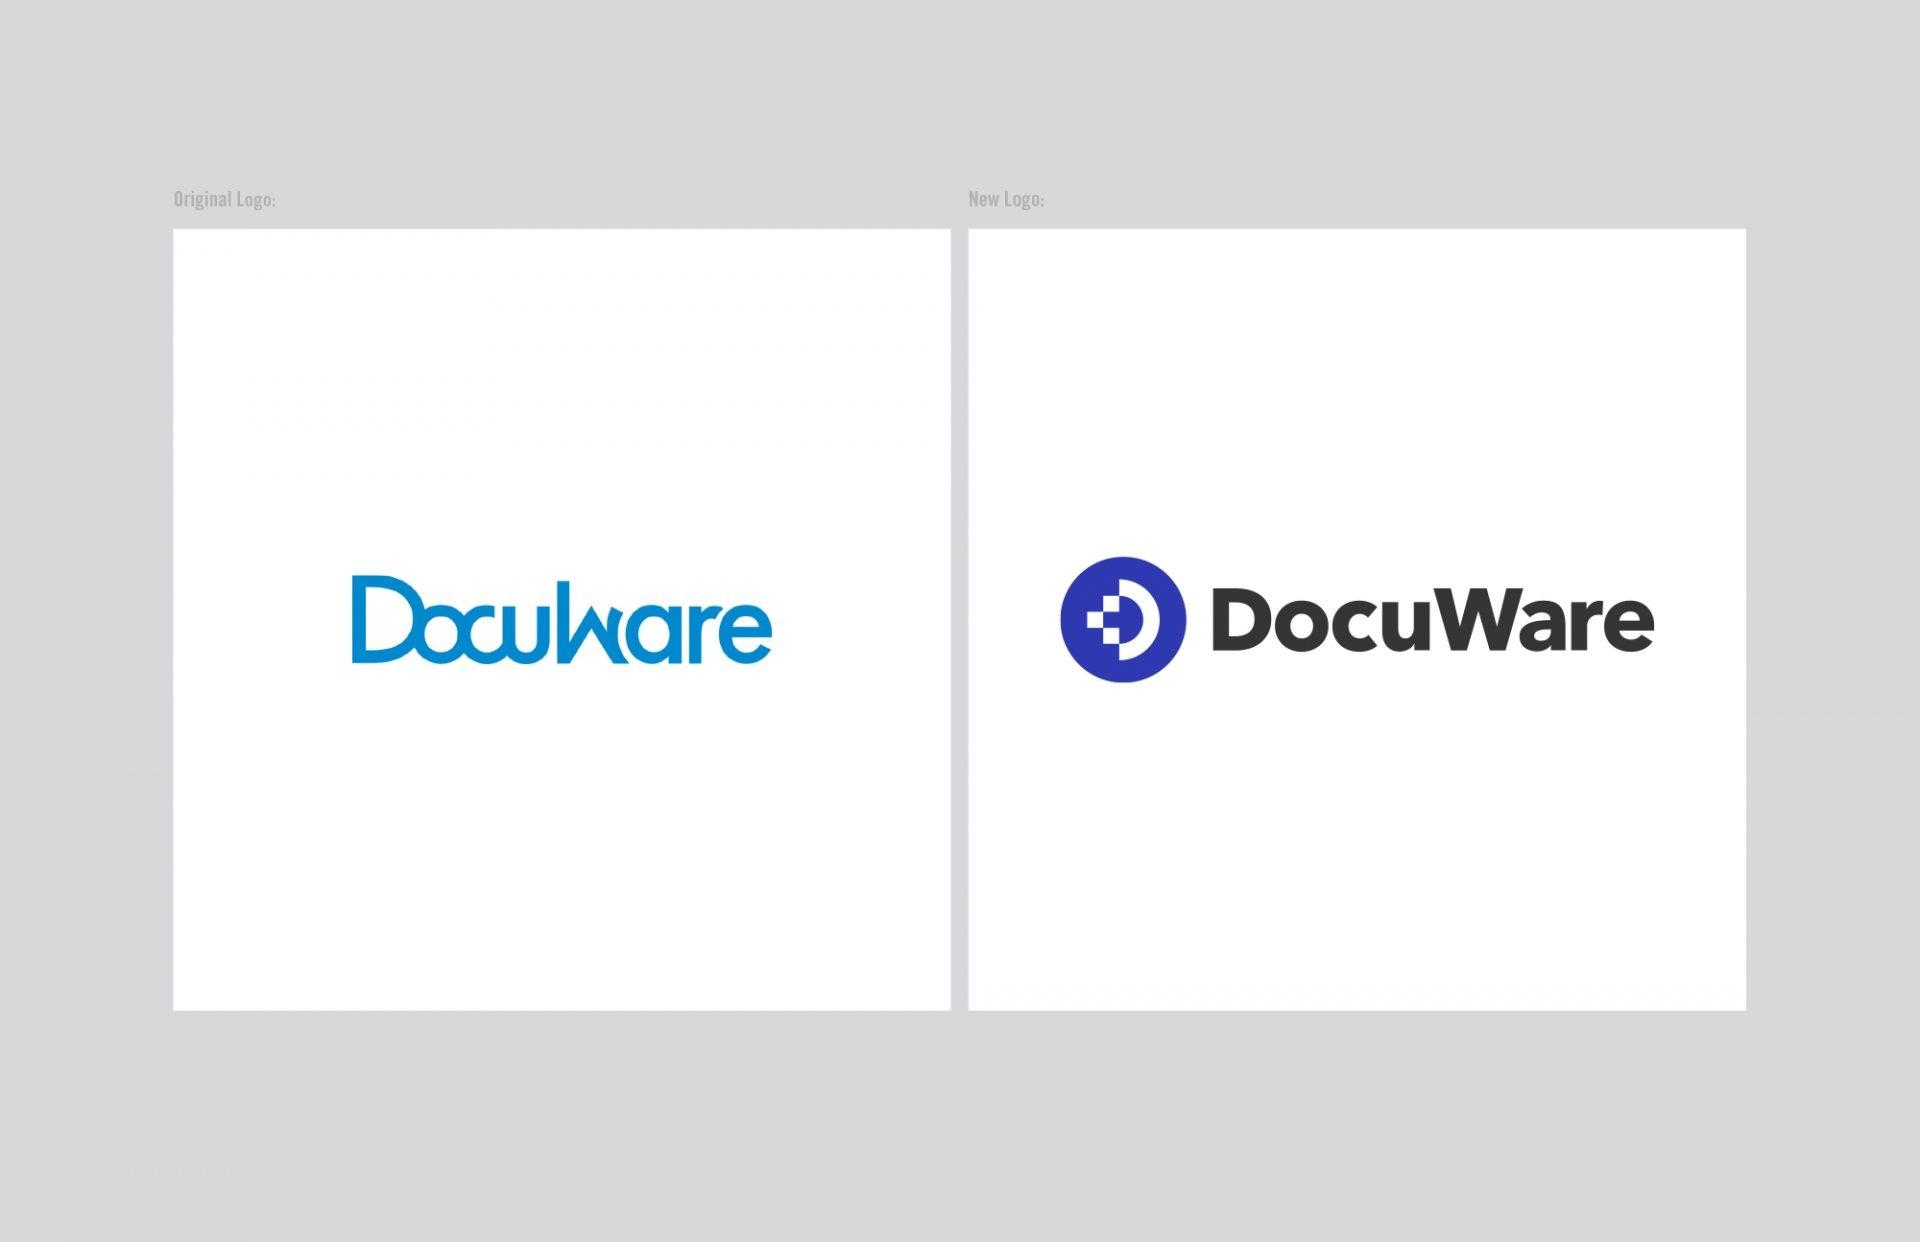 001_Logo_DocuWare_1